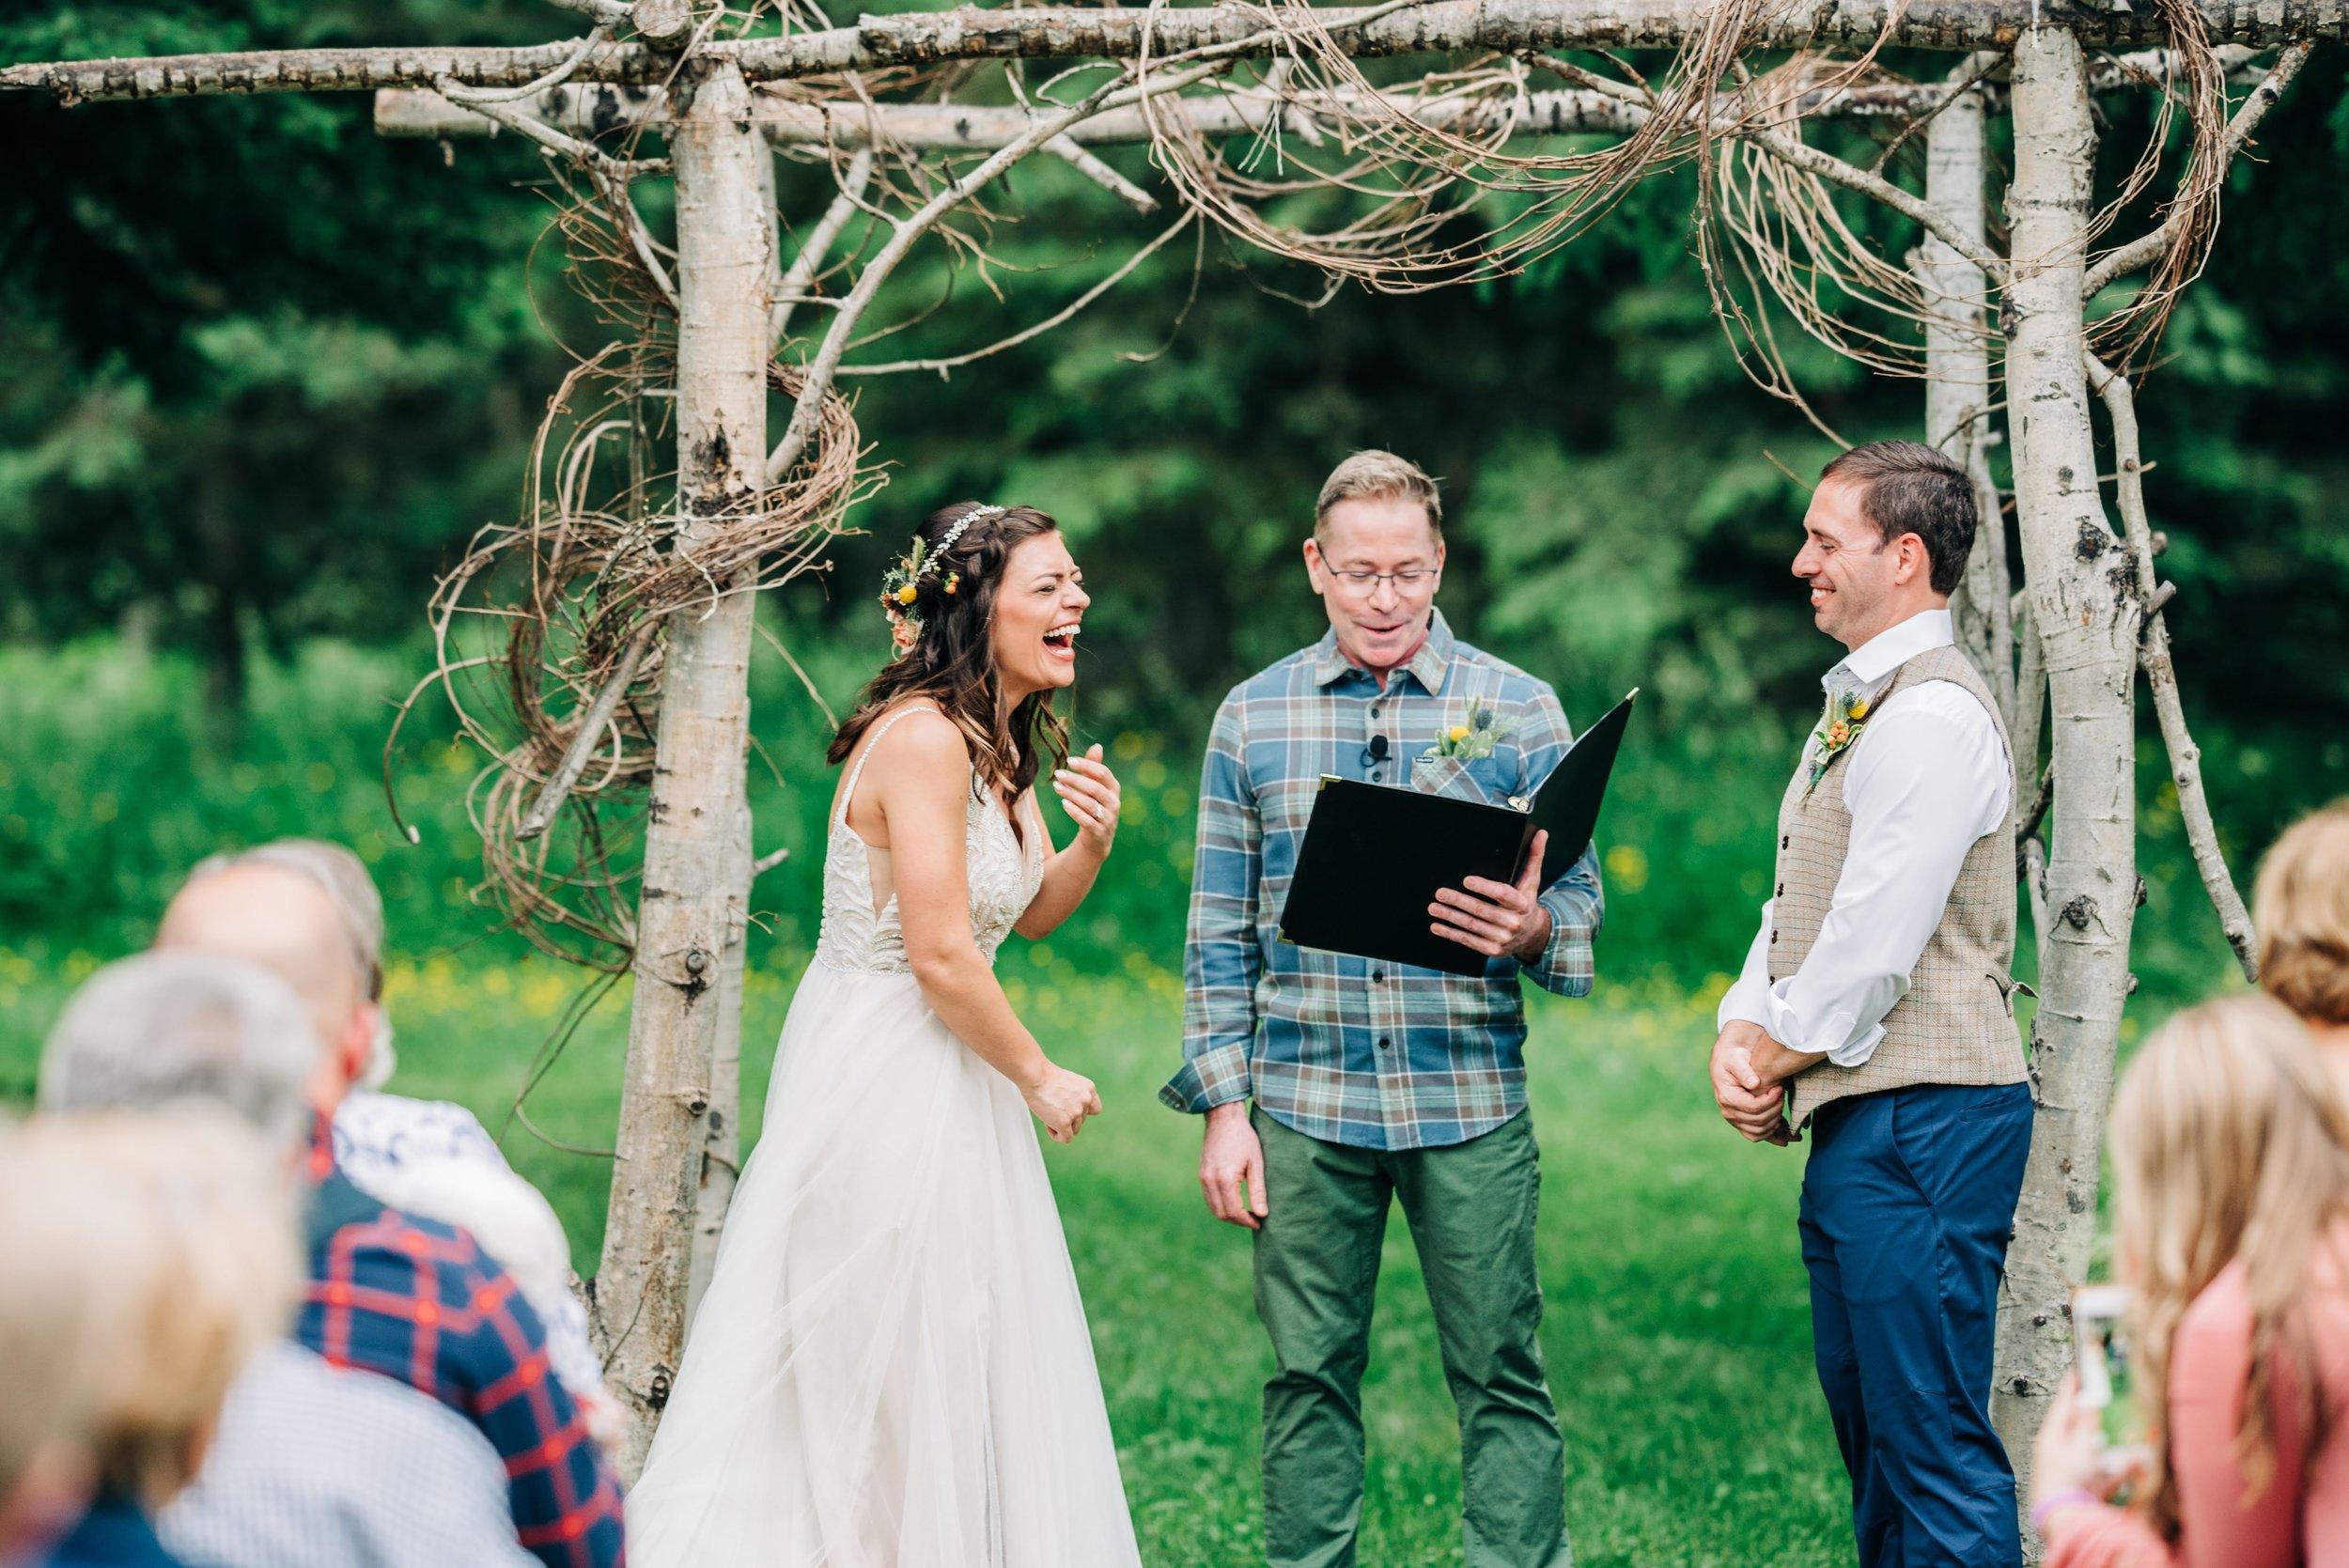 Tom rustic wedding.JPG